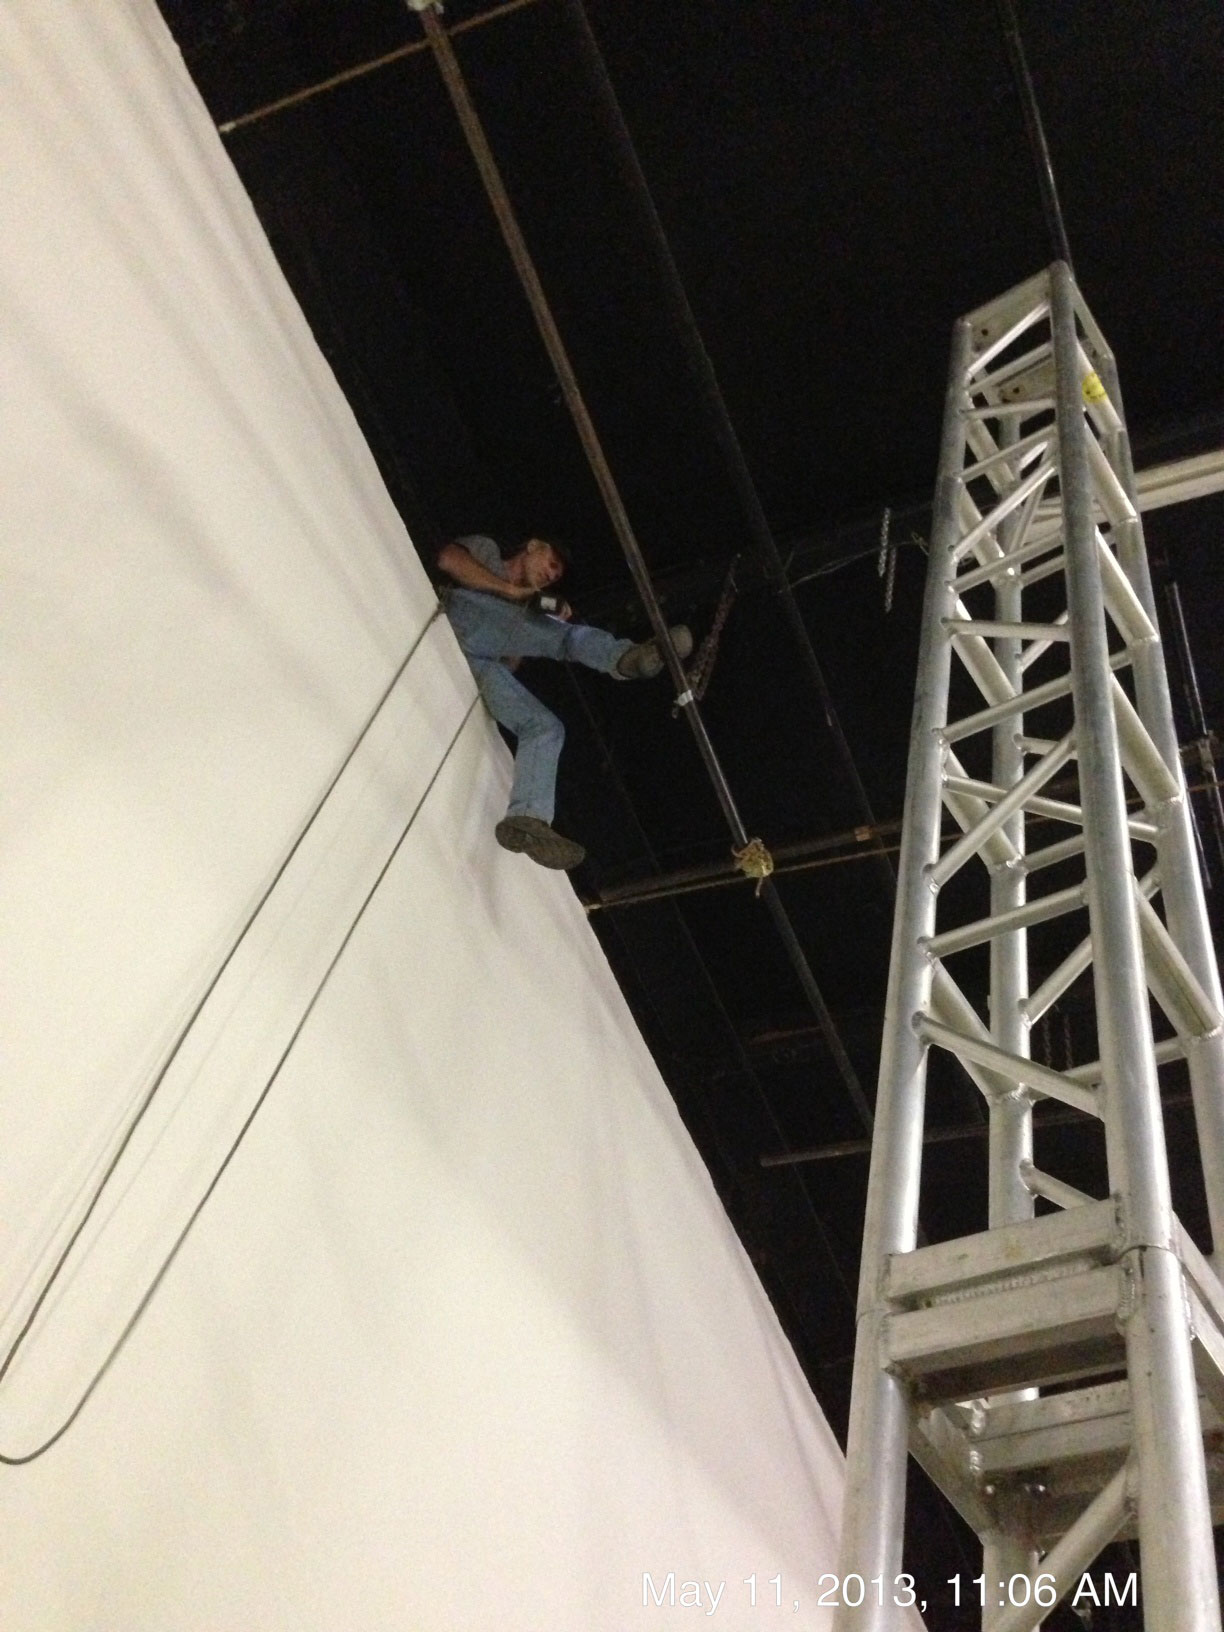 Stunt riggers